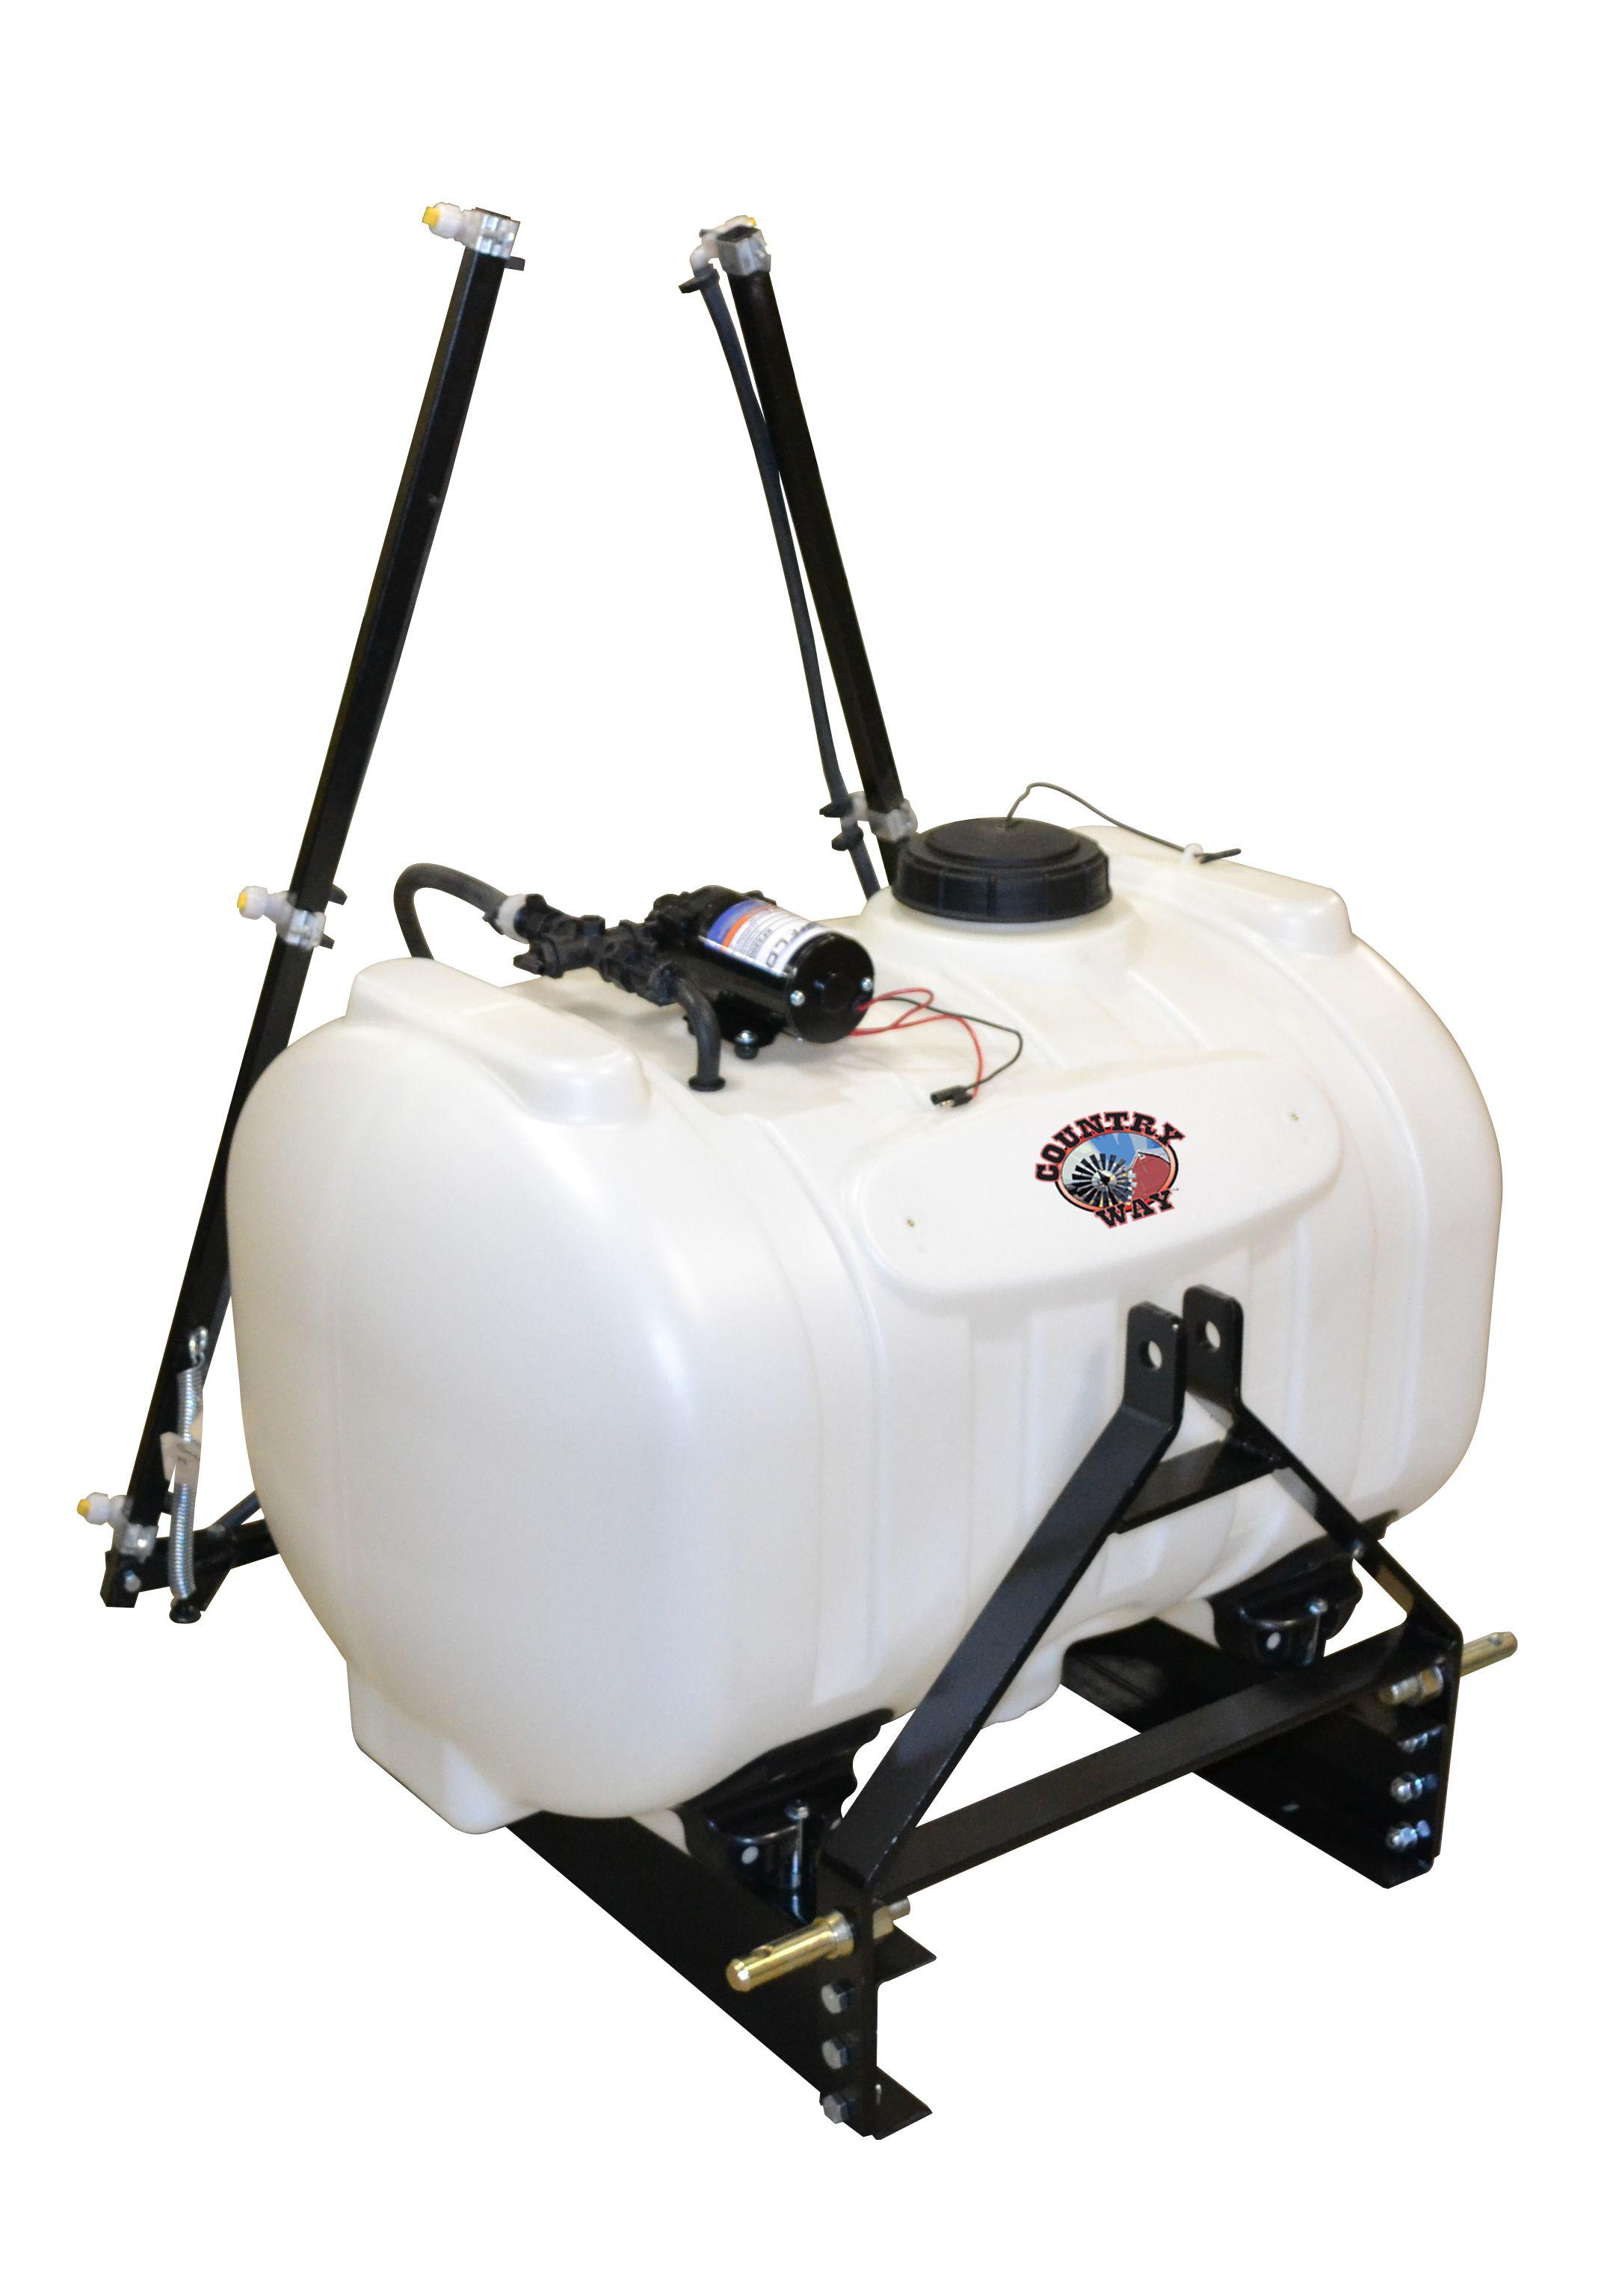 Country Way 60 Gallon 2 2 Gpm 3 Pt Sprayer S3o I1 060a Rk Gpm Sprayers Gallon